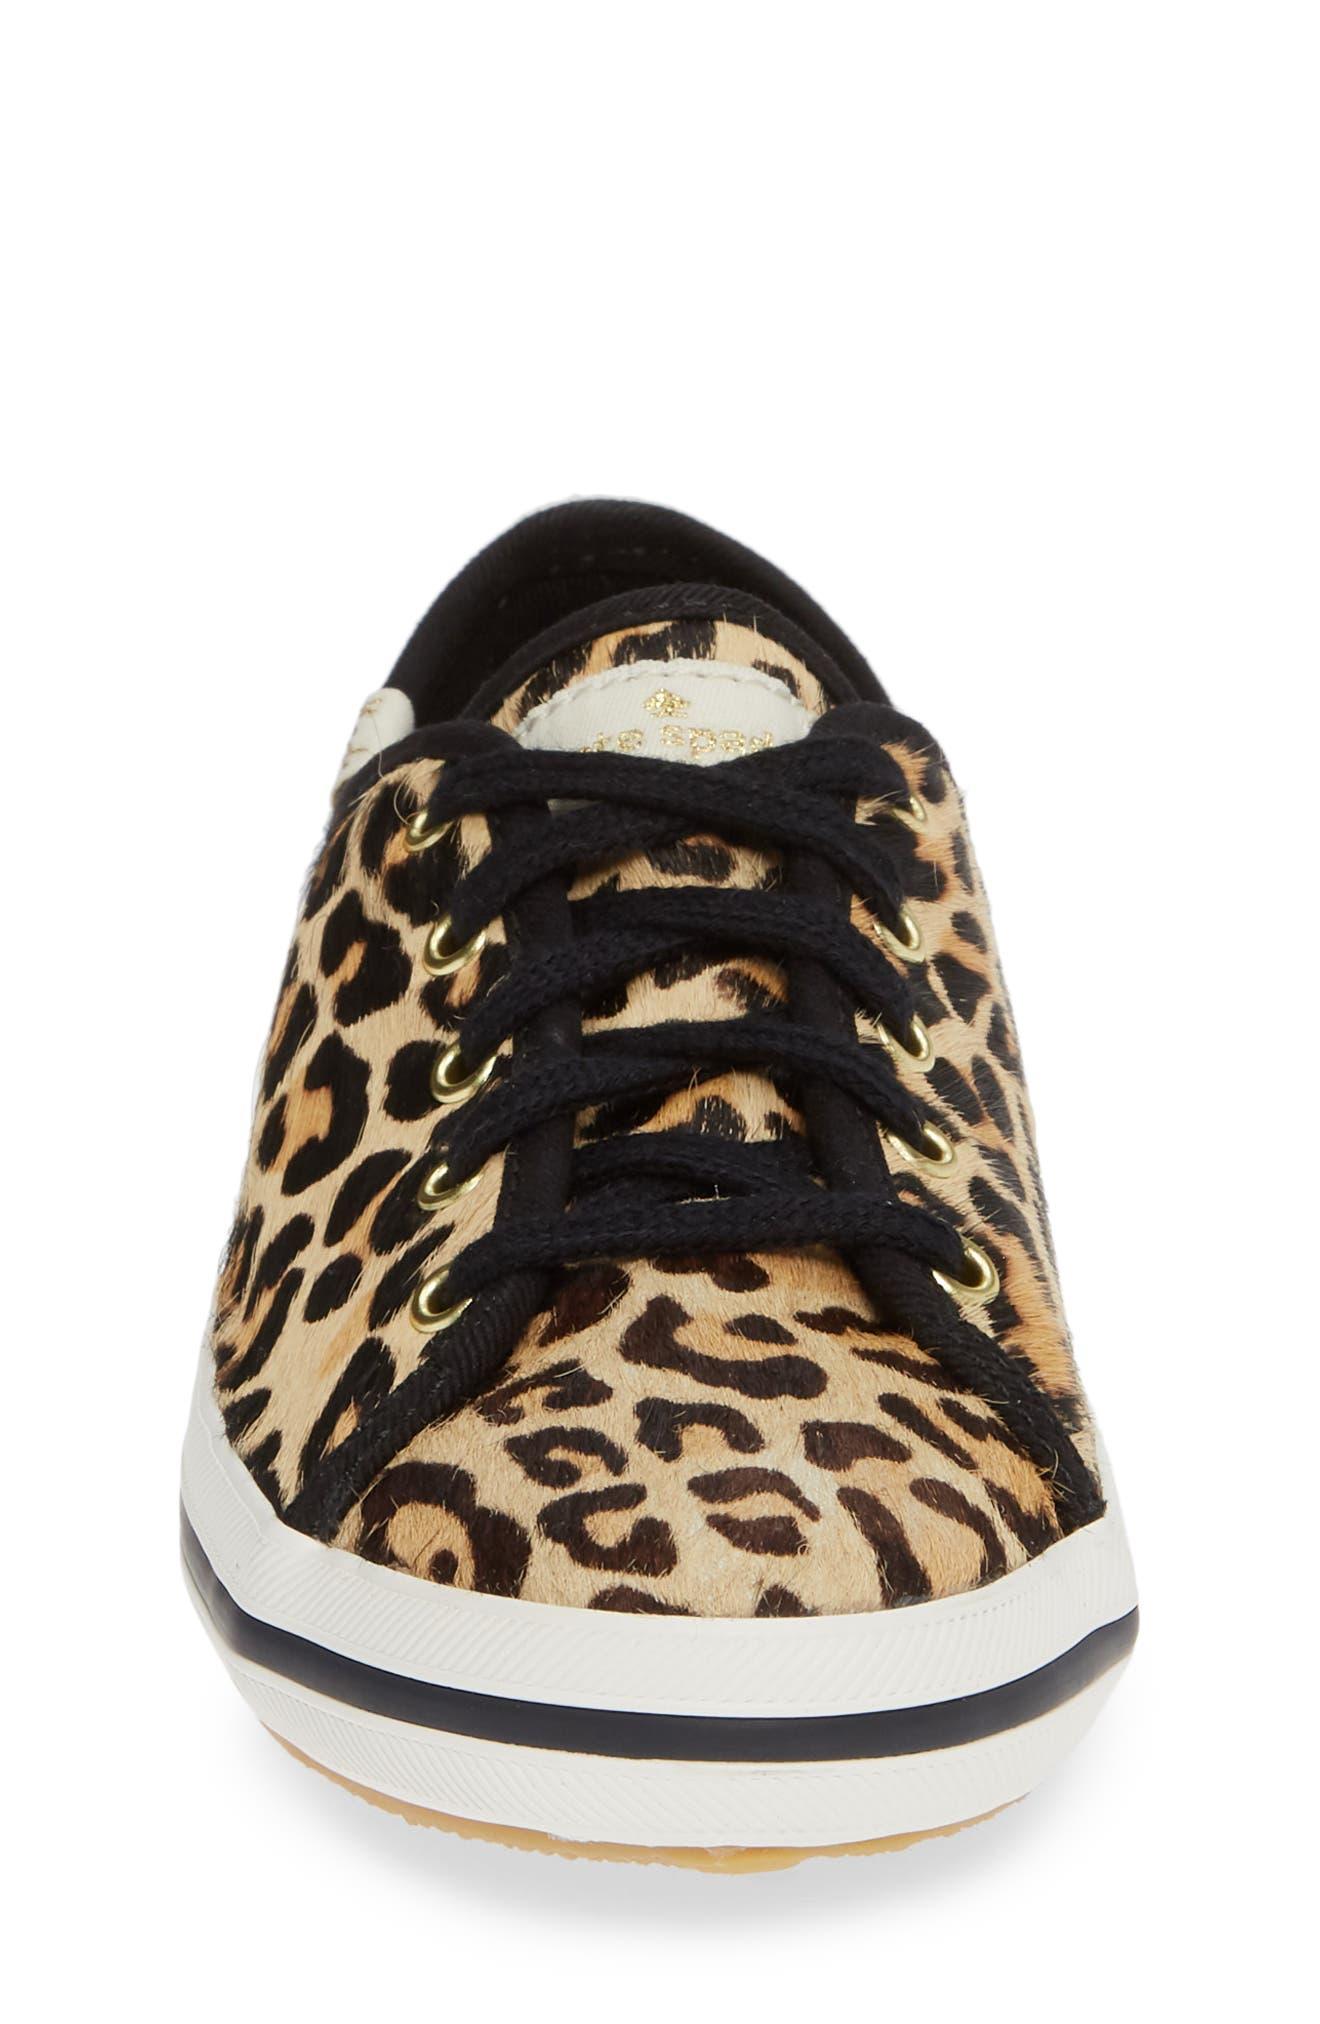 for kate spade new york kickstart genuine calf hair sneaker,                             Alternate thumbnail 4, color,                             PRINTED PONY